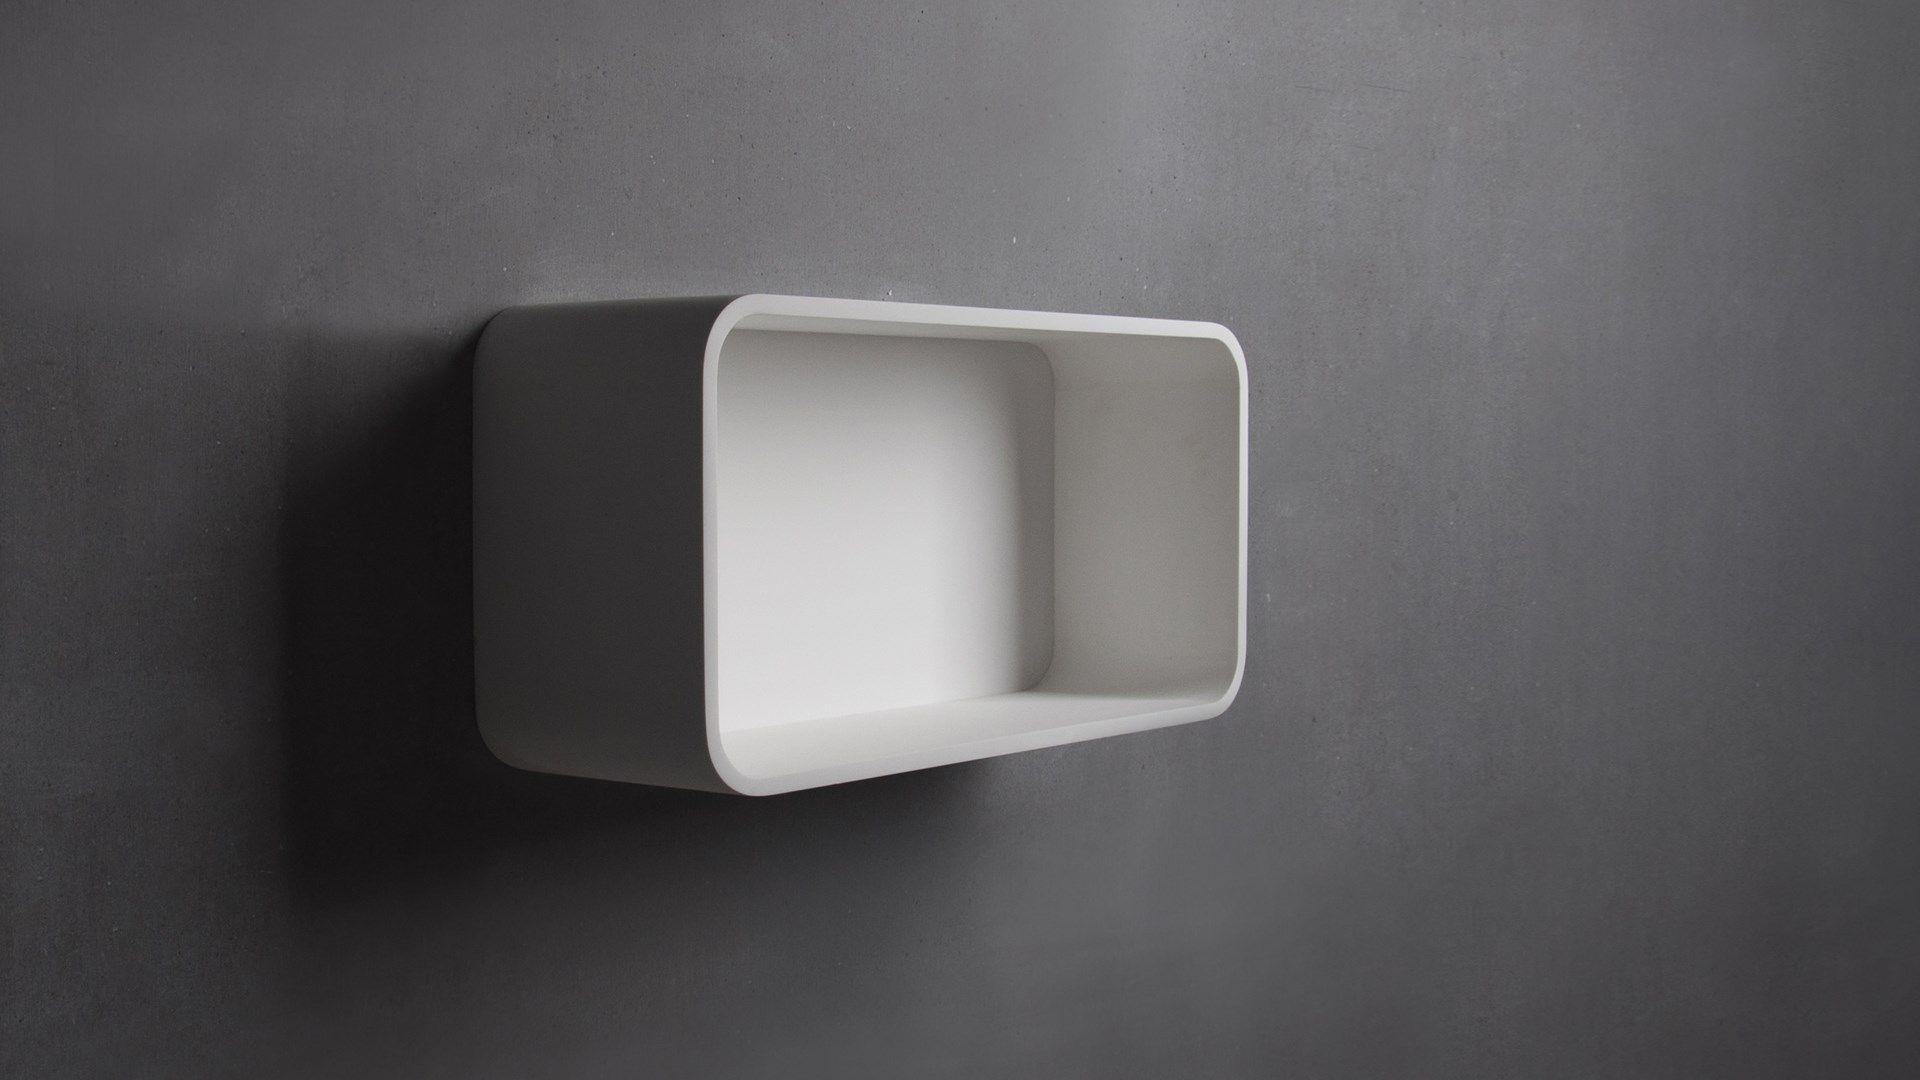 SSI Design Bideford badkamerkast Solid Surface 60x30x20cm